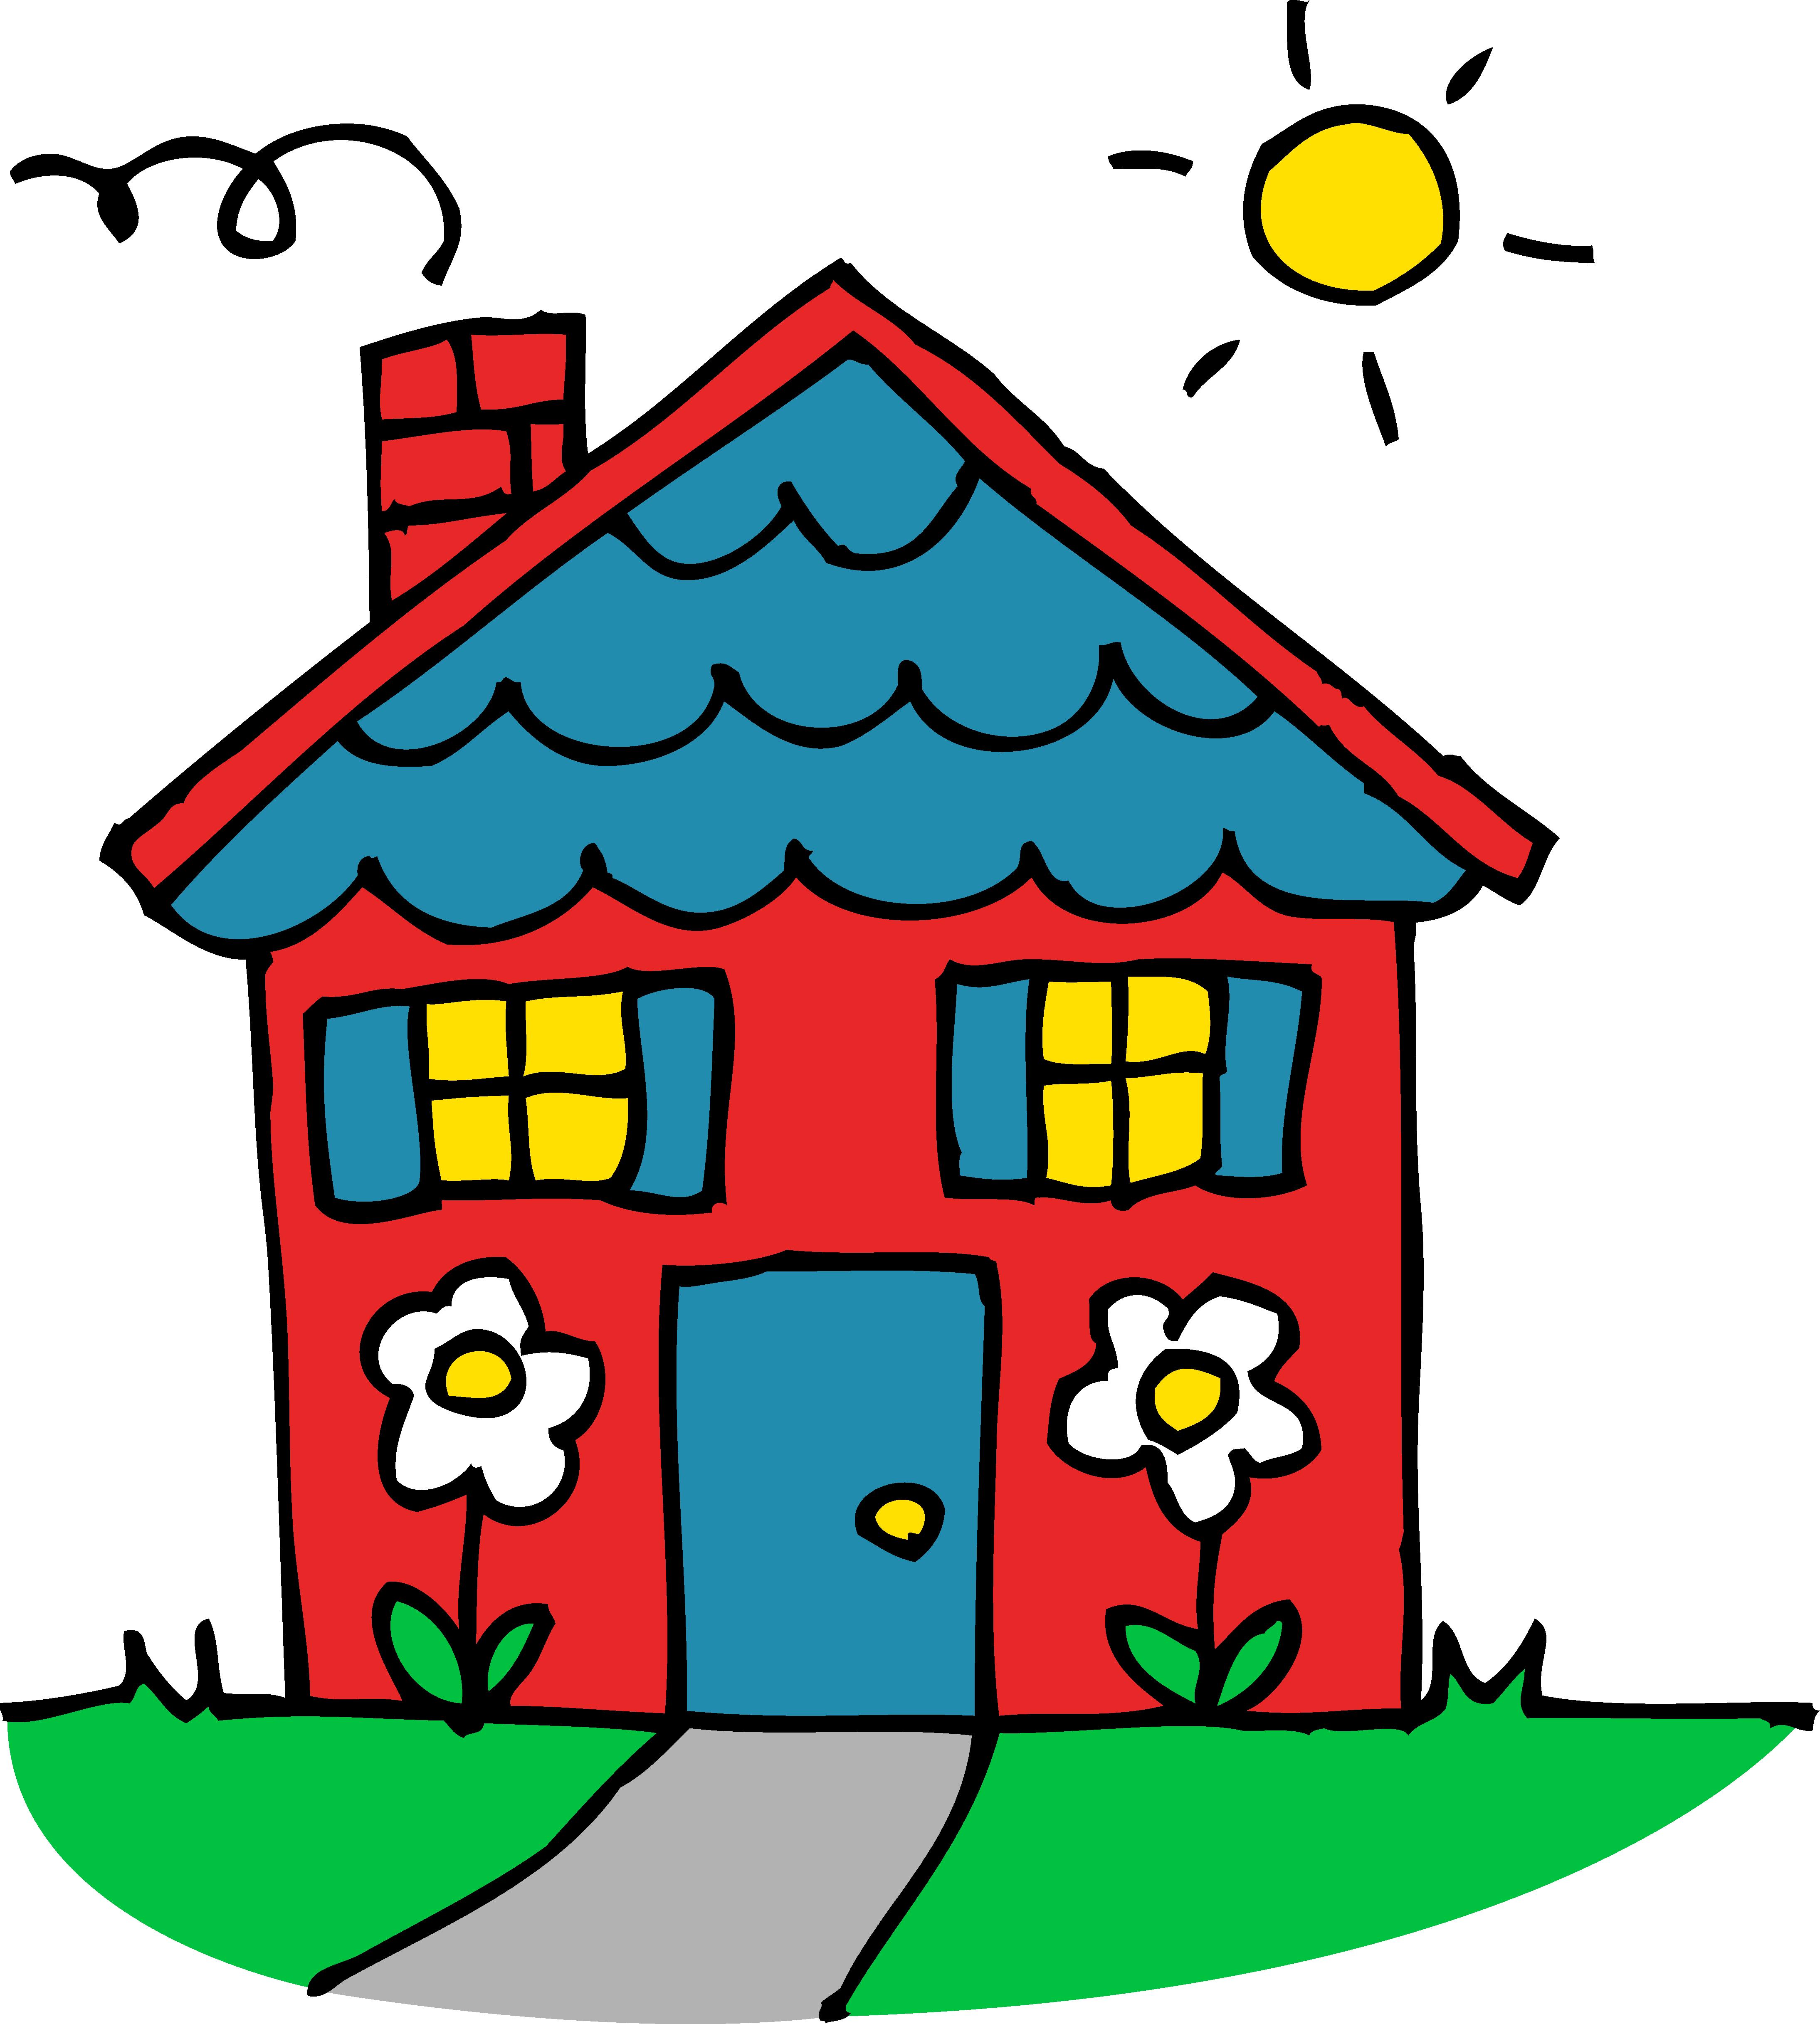 house for sale clip art-house for sale clip art-1